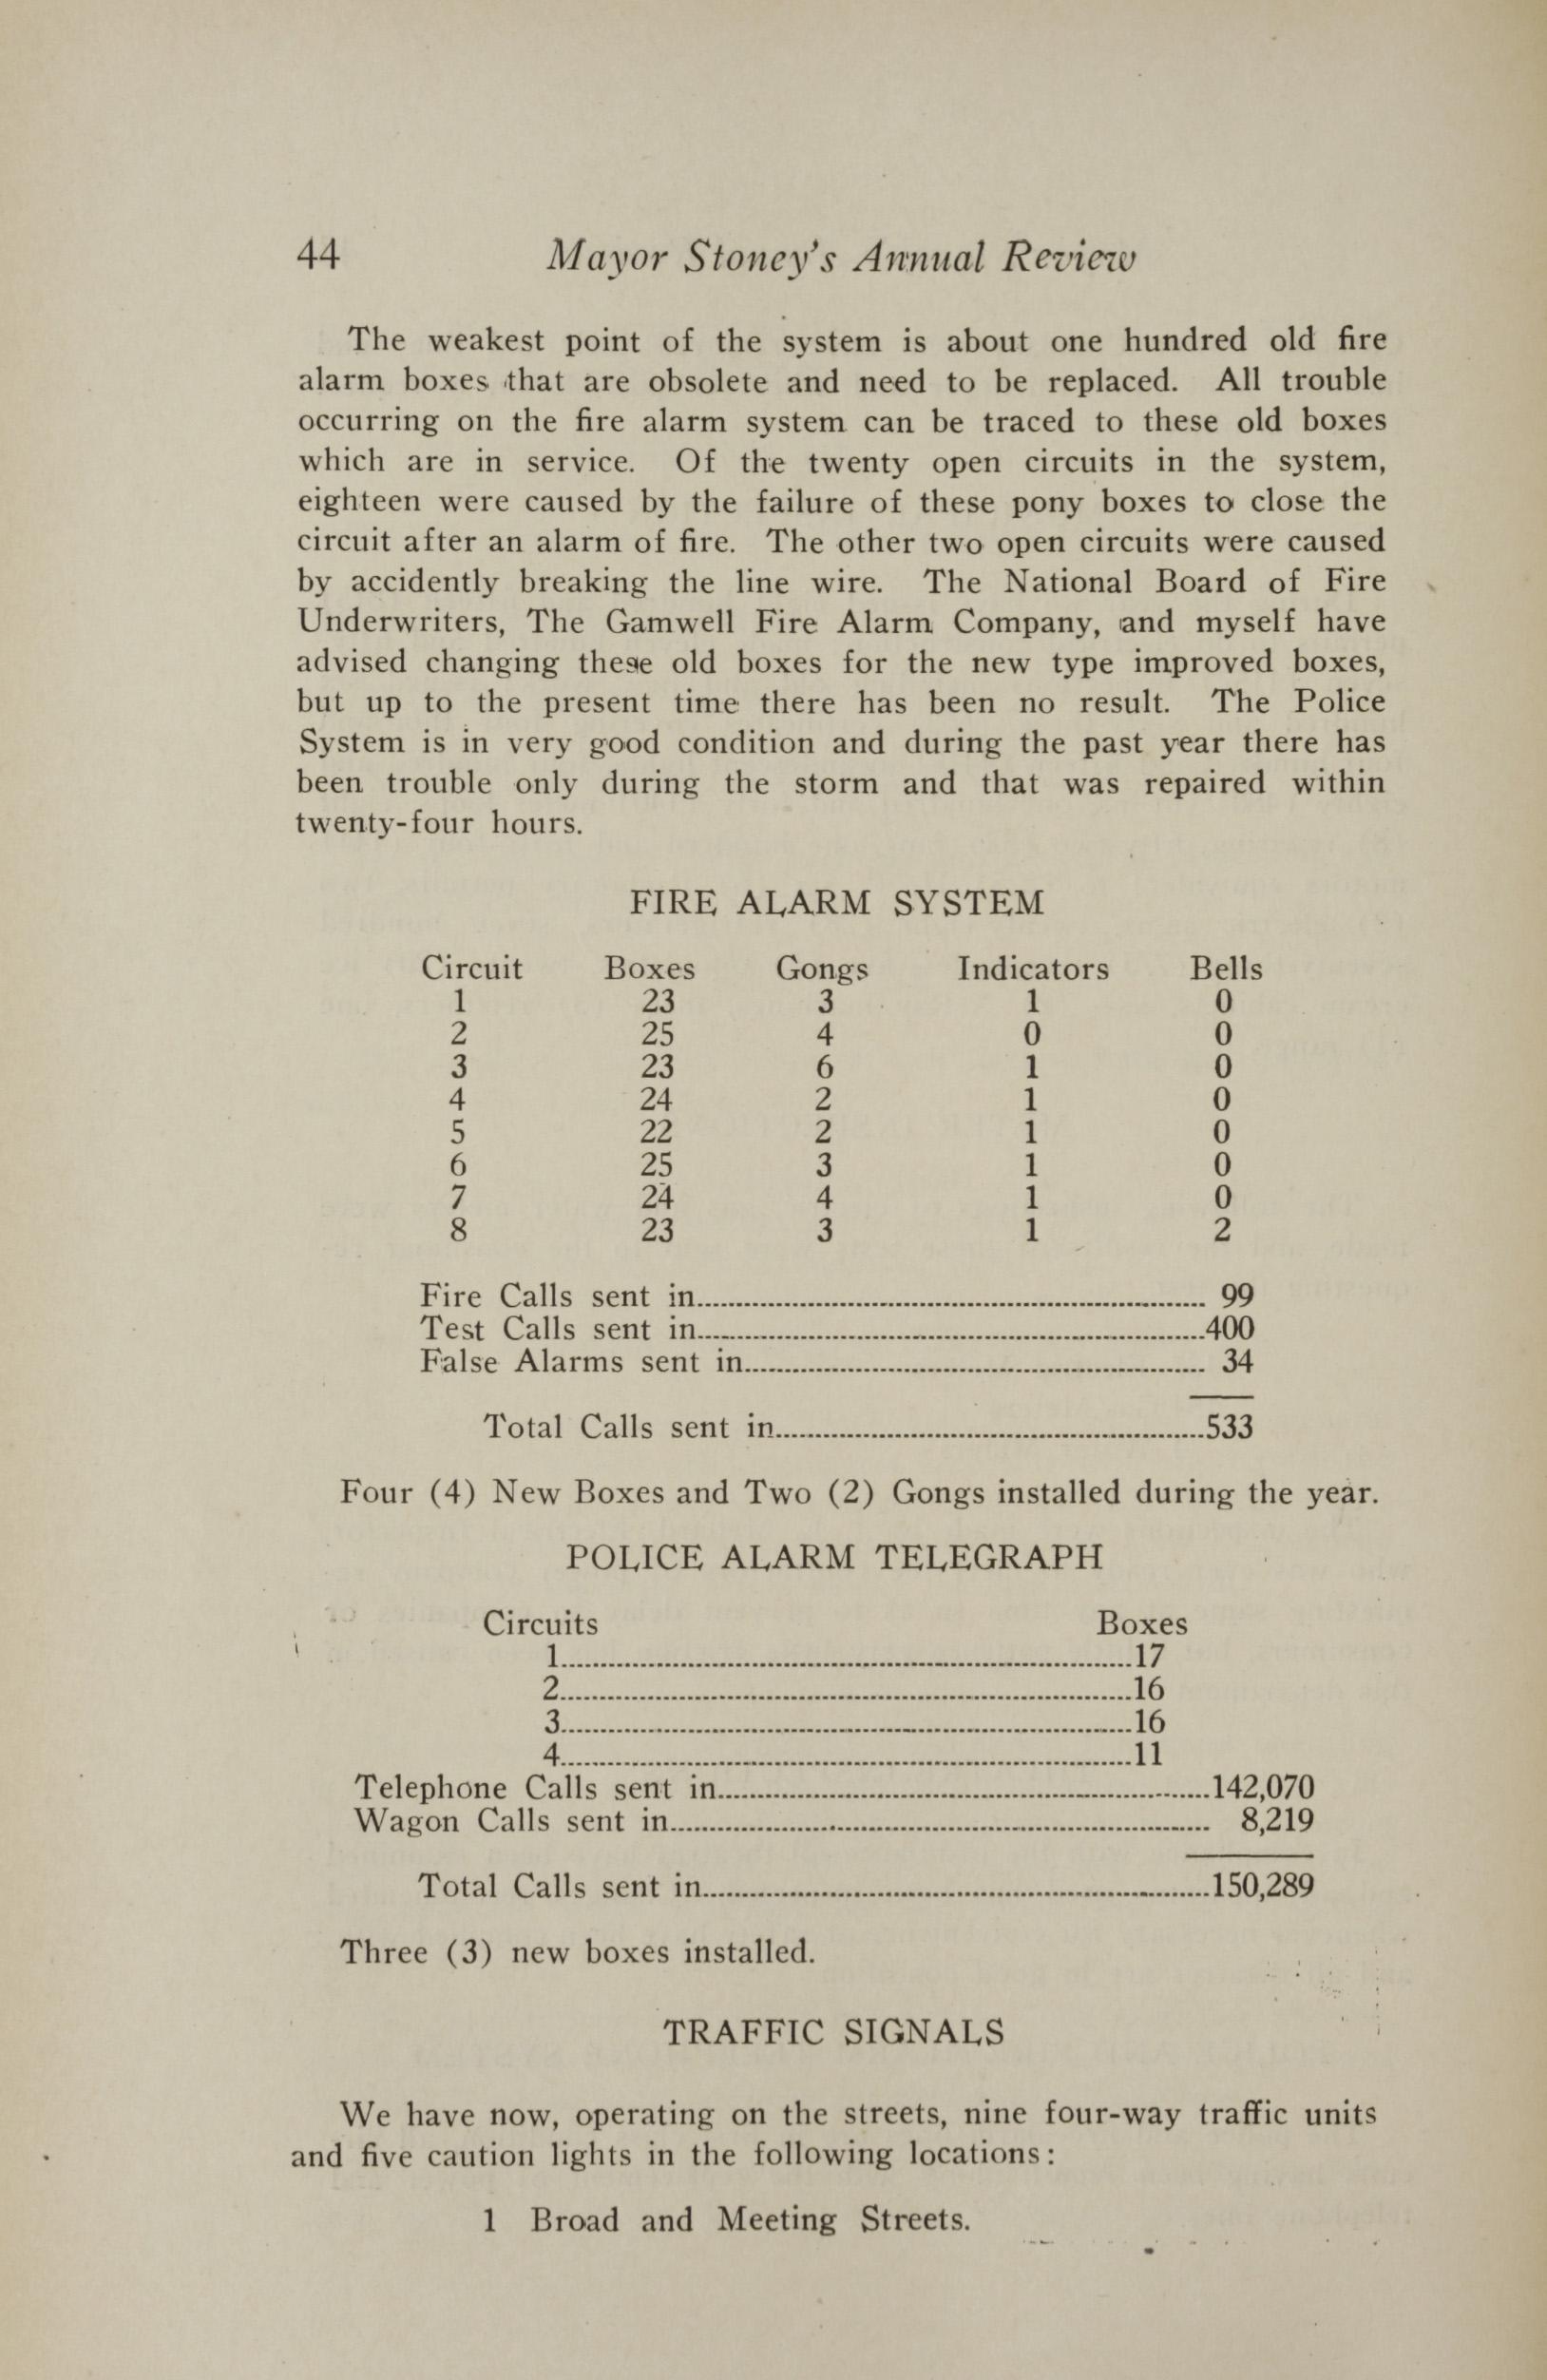 Charleston Yearbook, 1928, page 44